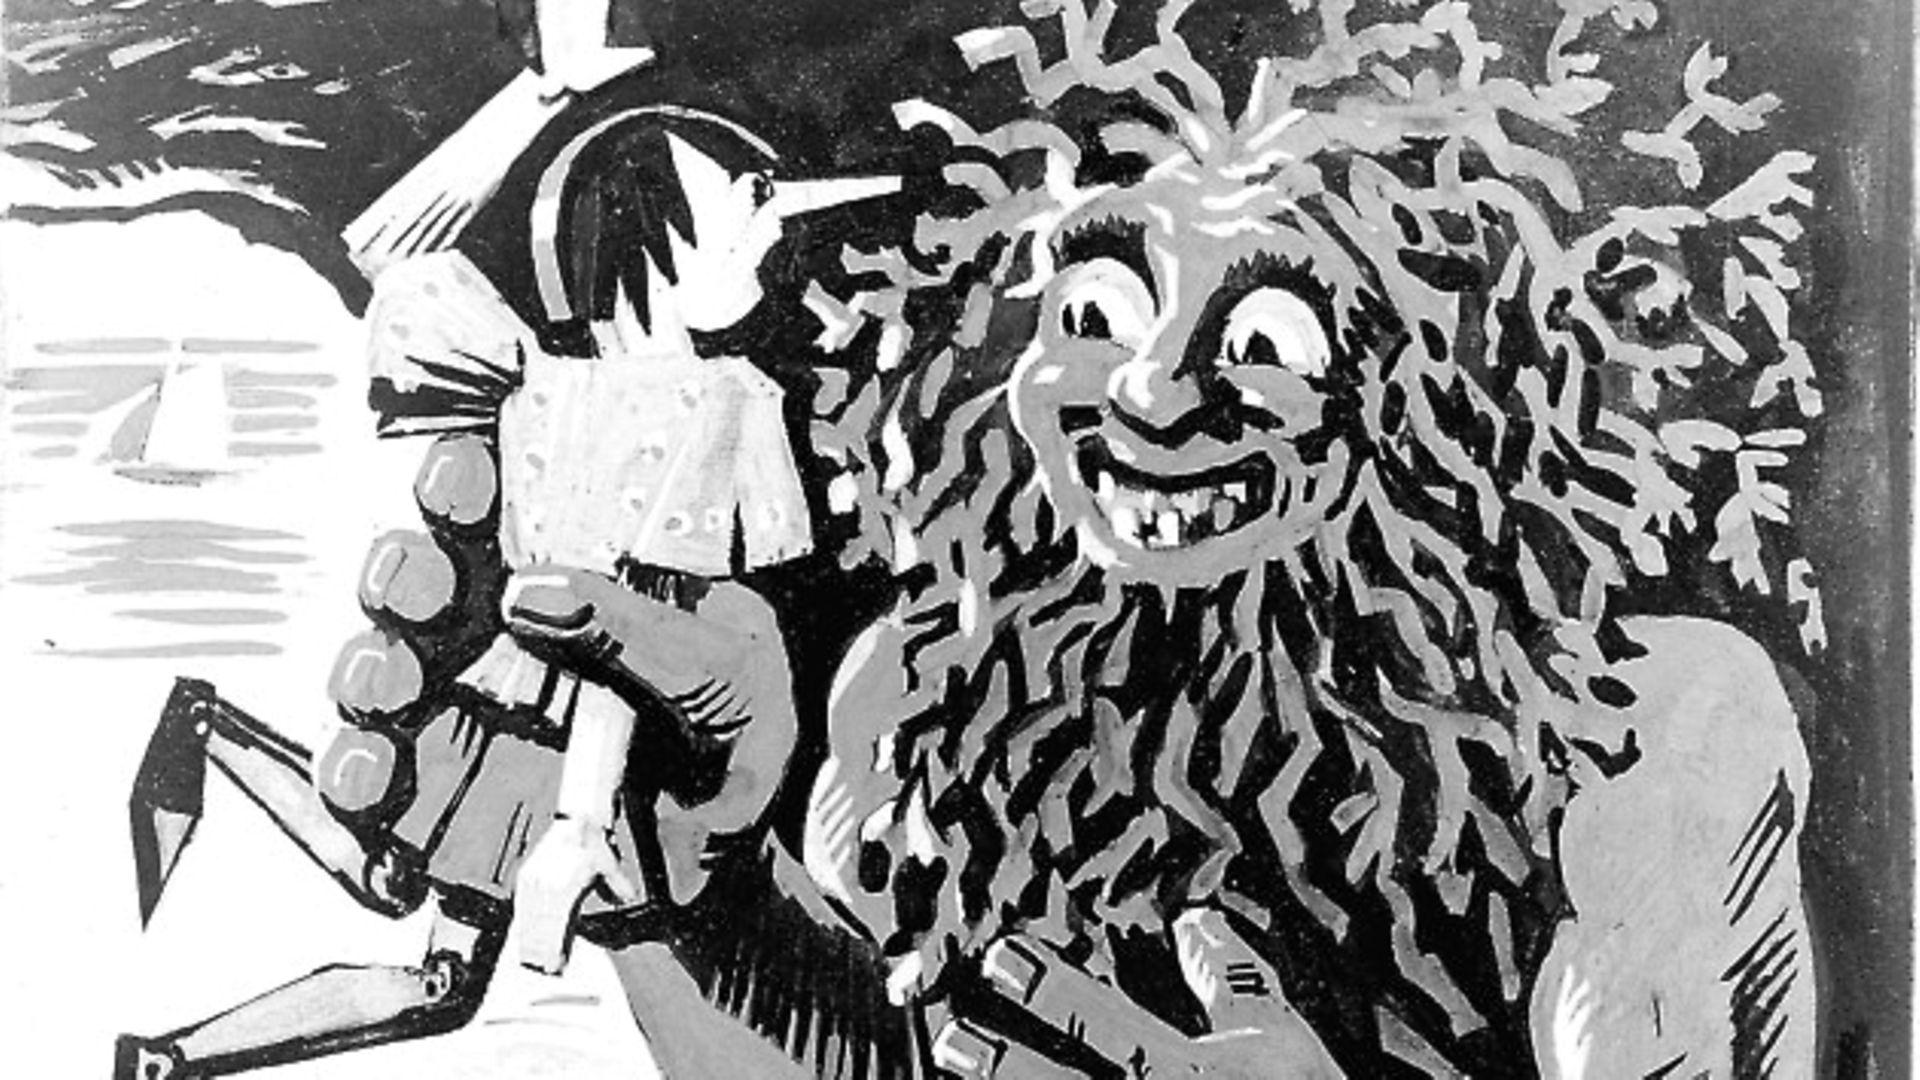 "Illustration for Carlo Collodi's ""Pinocchio"" by Rob d'Ac. - Credit: Roger-Viollet / Topfoto"